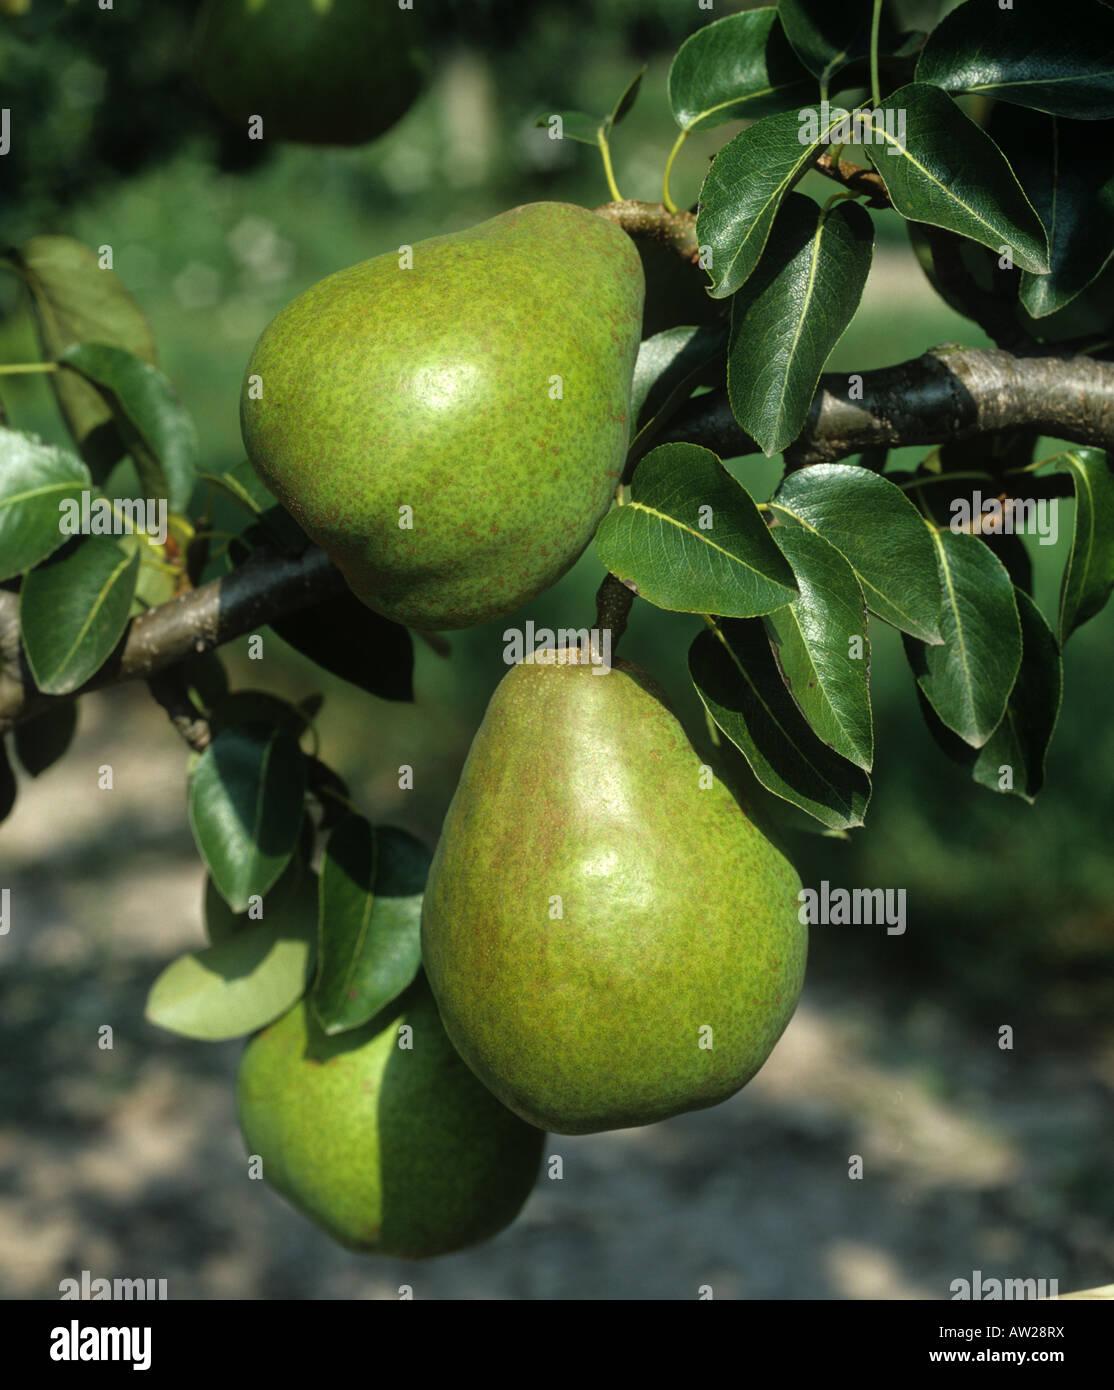 Reife Doyenne du Comice Birnenfrucht am Baum, Oxfordshire Stockbild